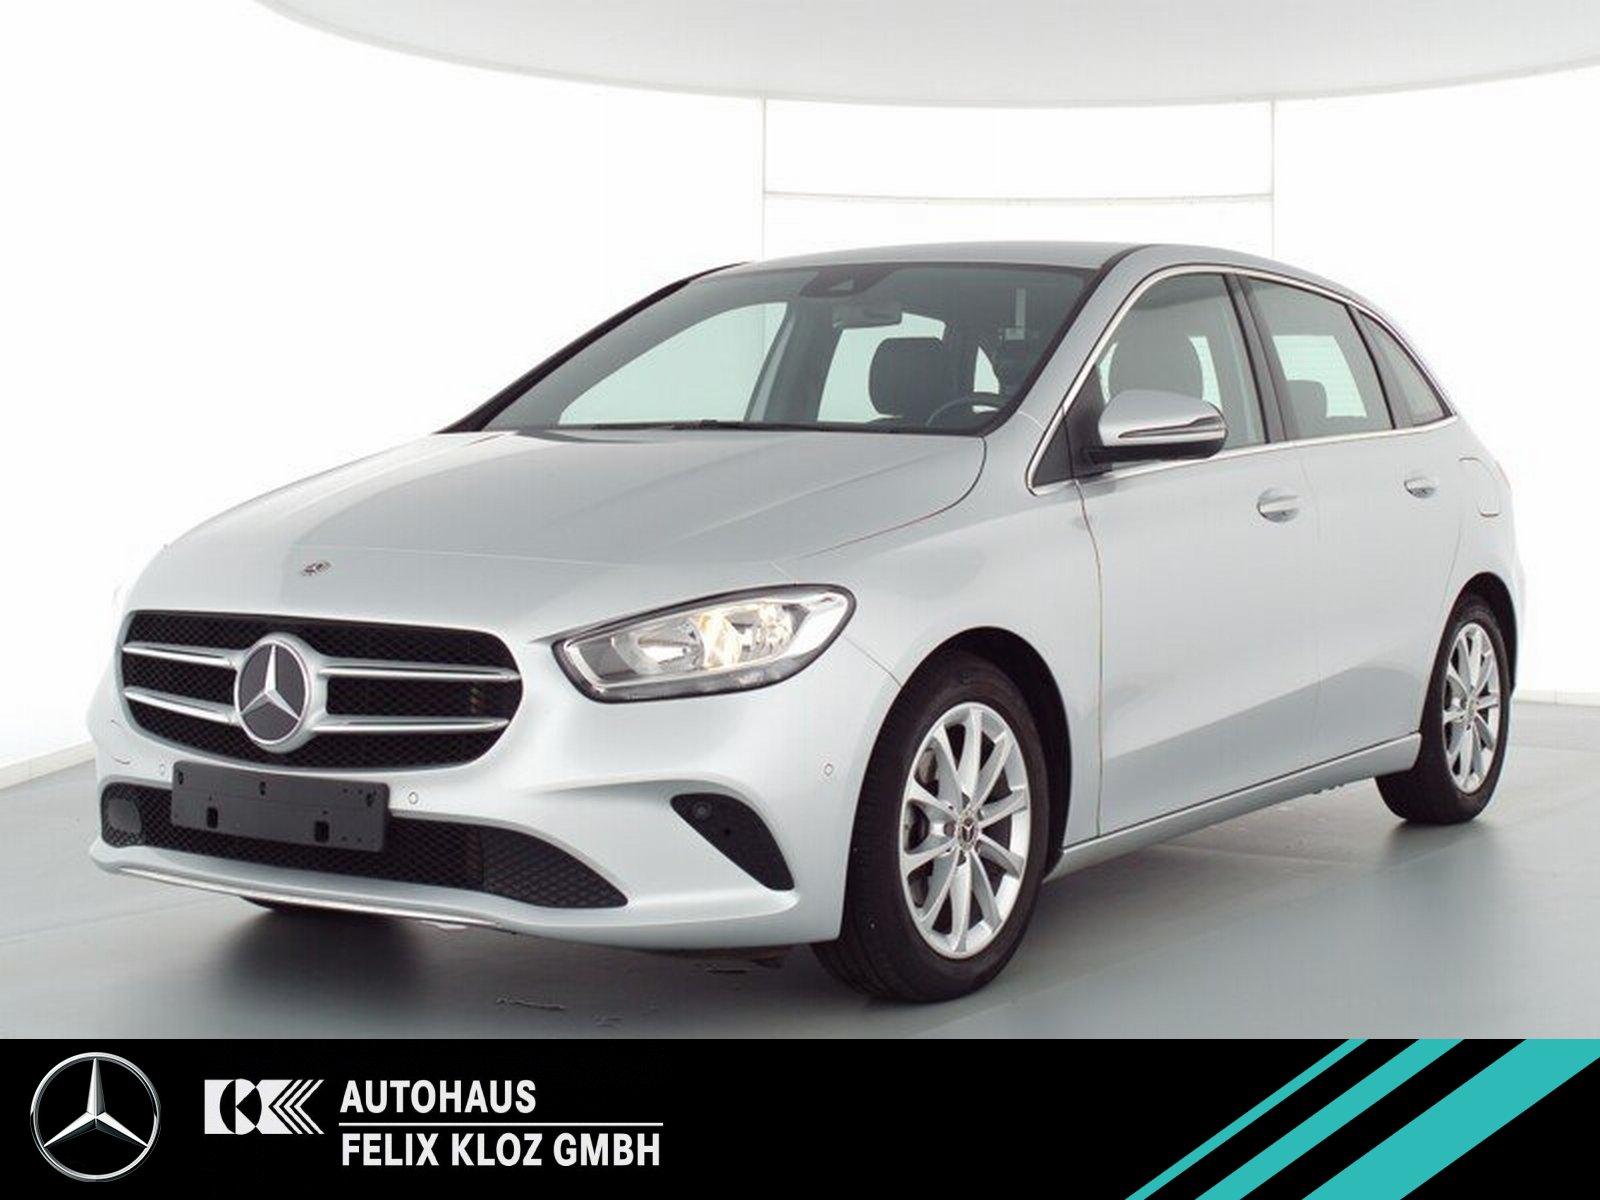 Mercedes-Benz B 180 Progressive*Navi-Premium*MBUX*Sitzheizung*, Jahr 2019, Benzin